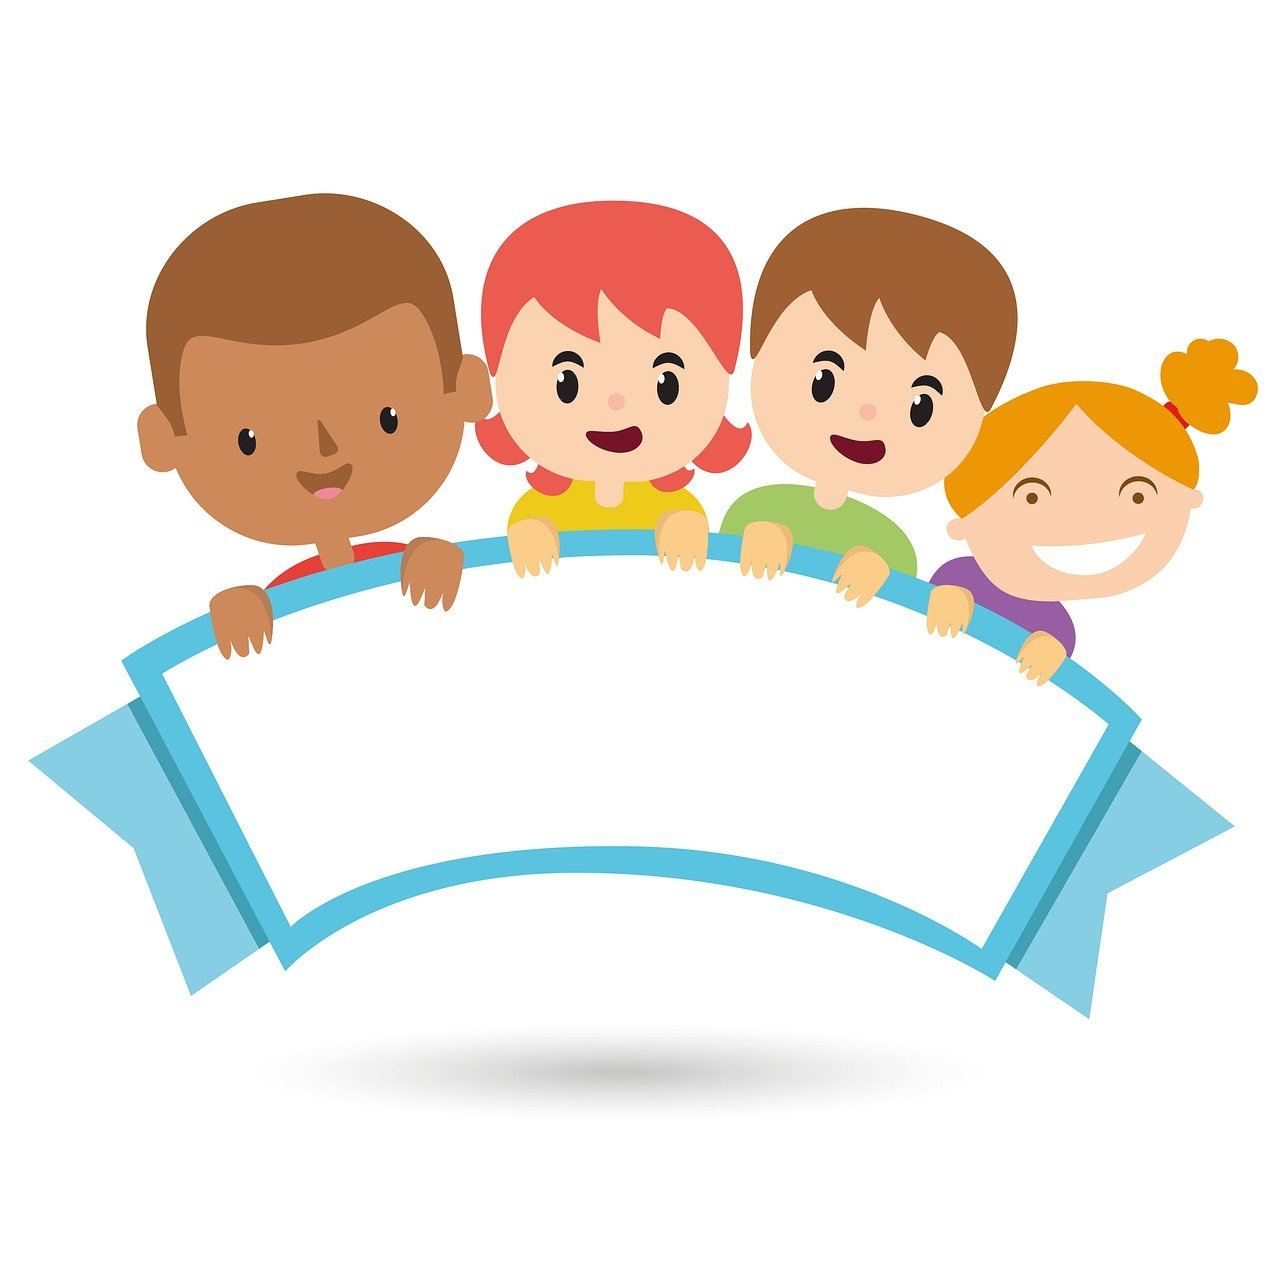 Children happy kids dancing clipart free clipart images - Clipartix |  Children's day, Happy children's day, Kids clipart